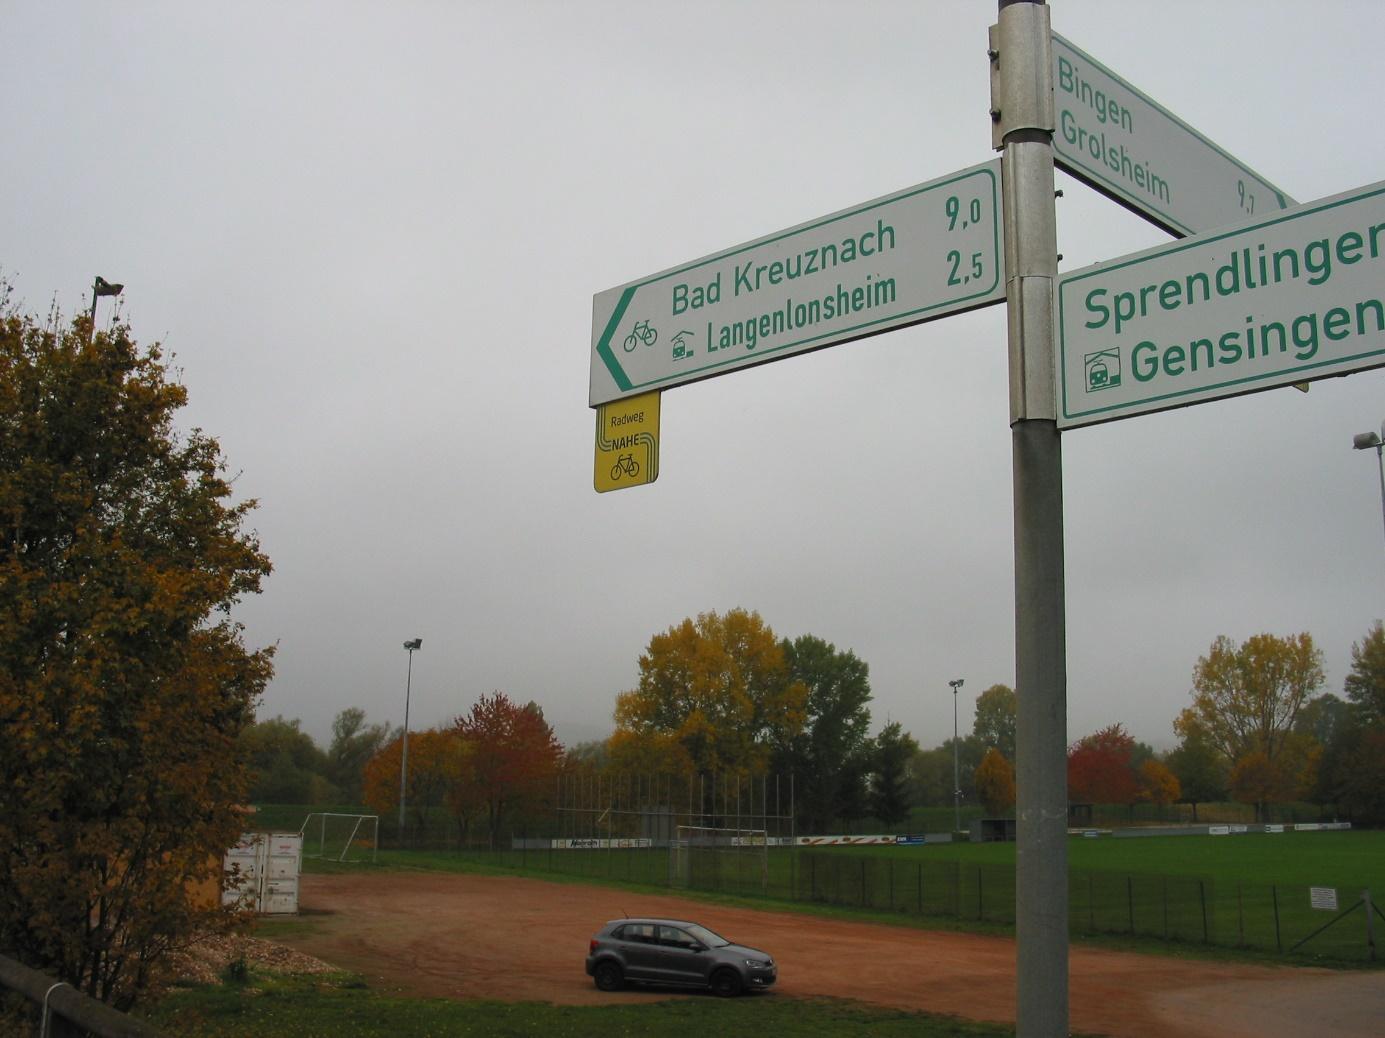 39-01_Naheradweg_Kreuznach.jpg